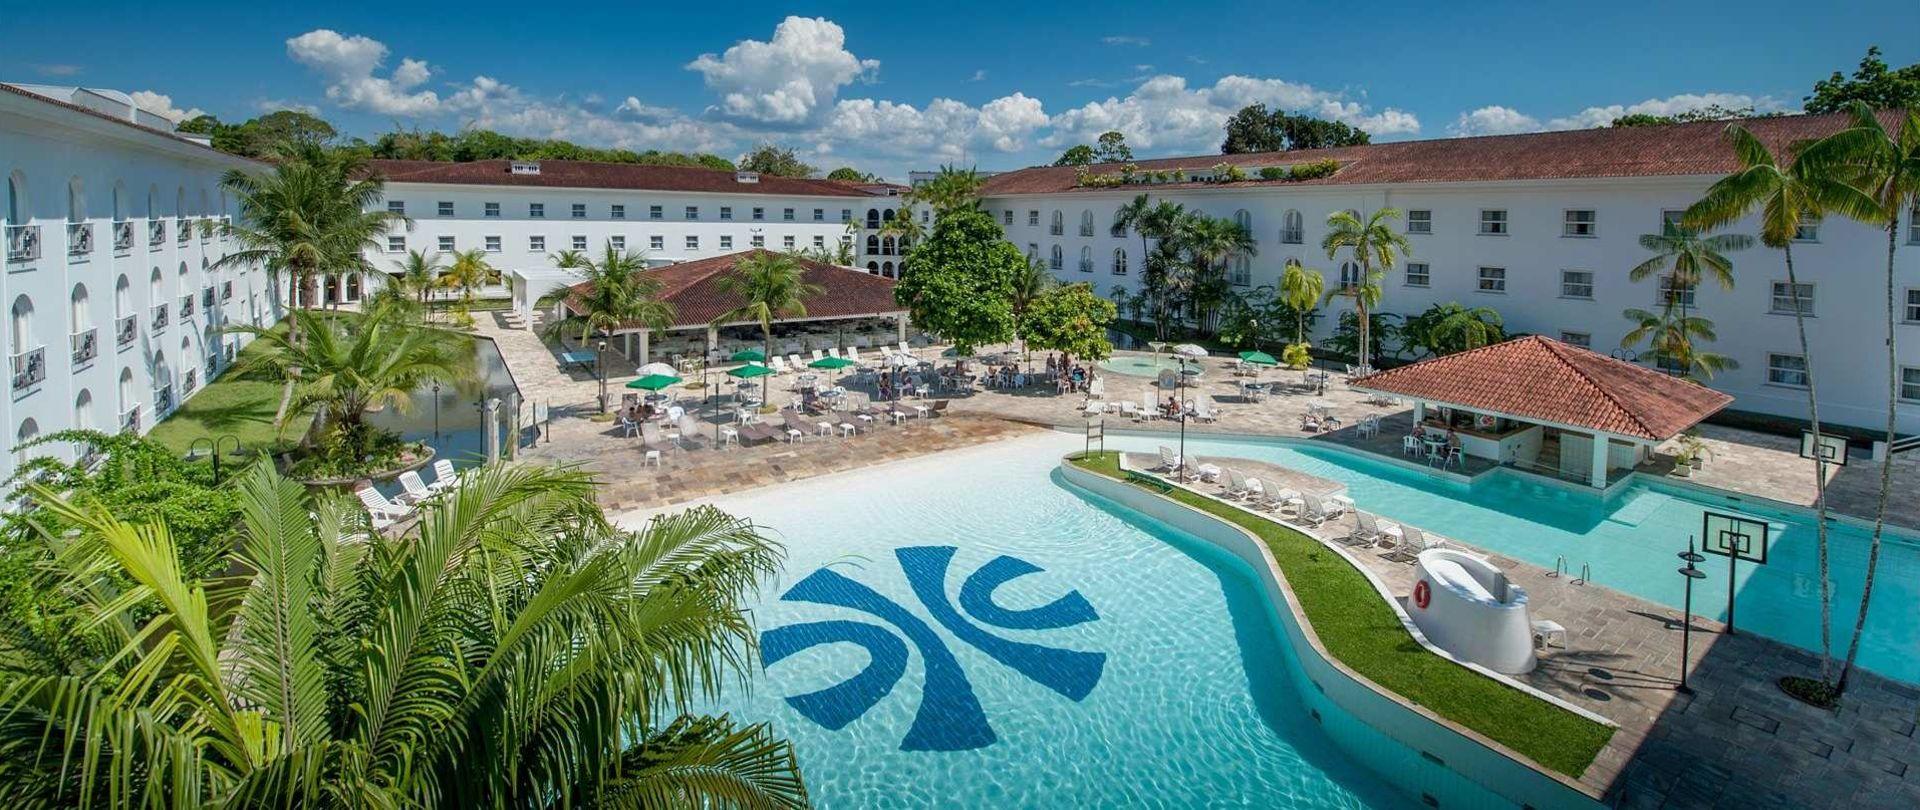 Tropical Eco Resort Pool